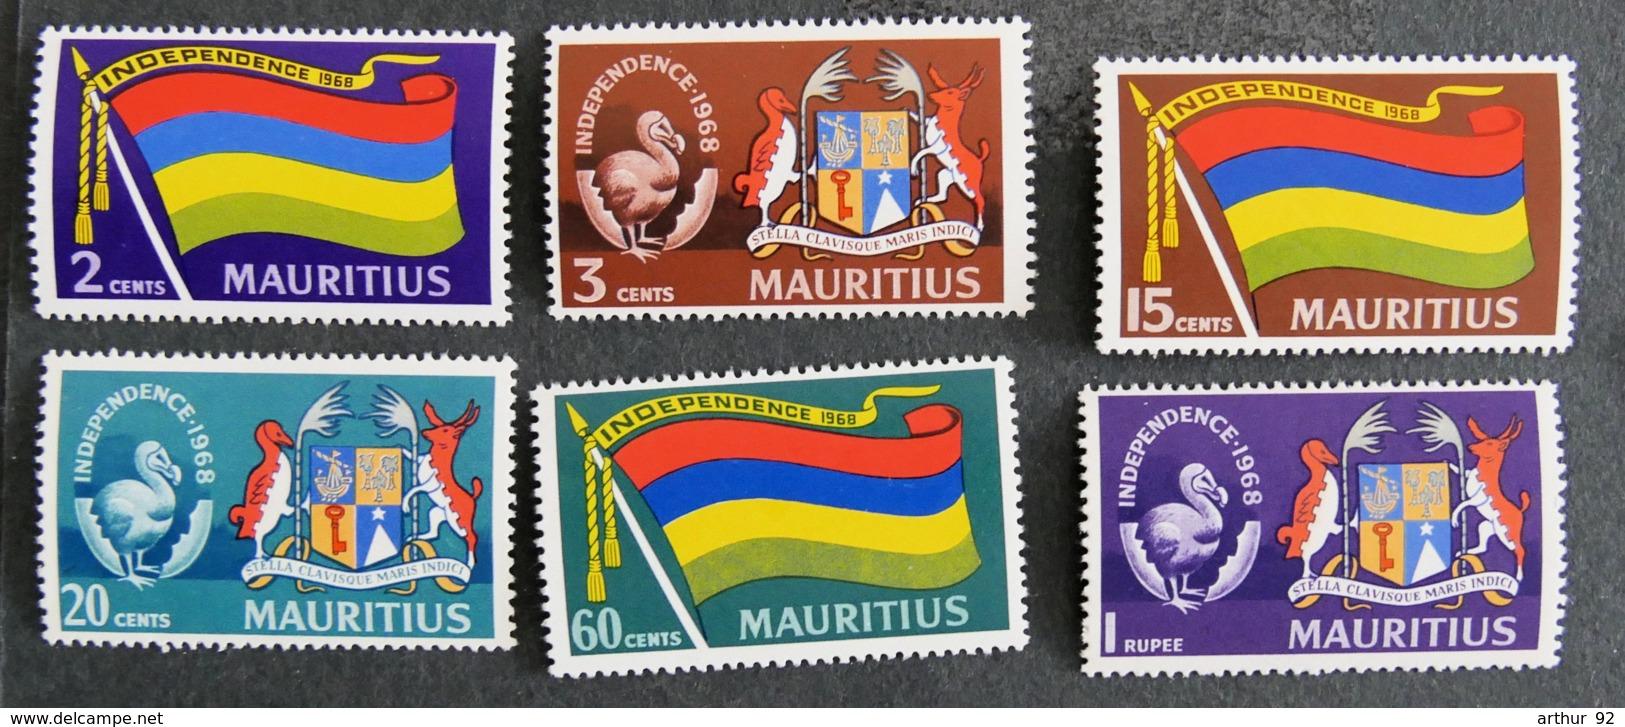 ILE MAURICE - MAURITIUS - 1968 - YT 311** à 316** - INDEPENDANCE - Mauritius (1968-...)